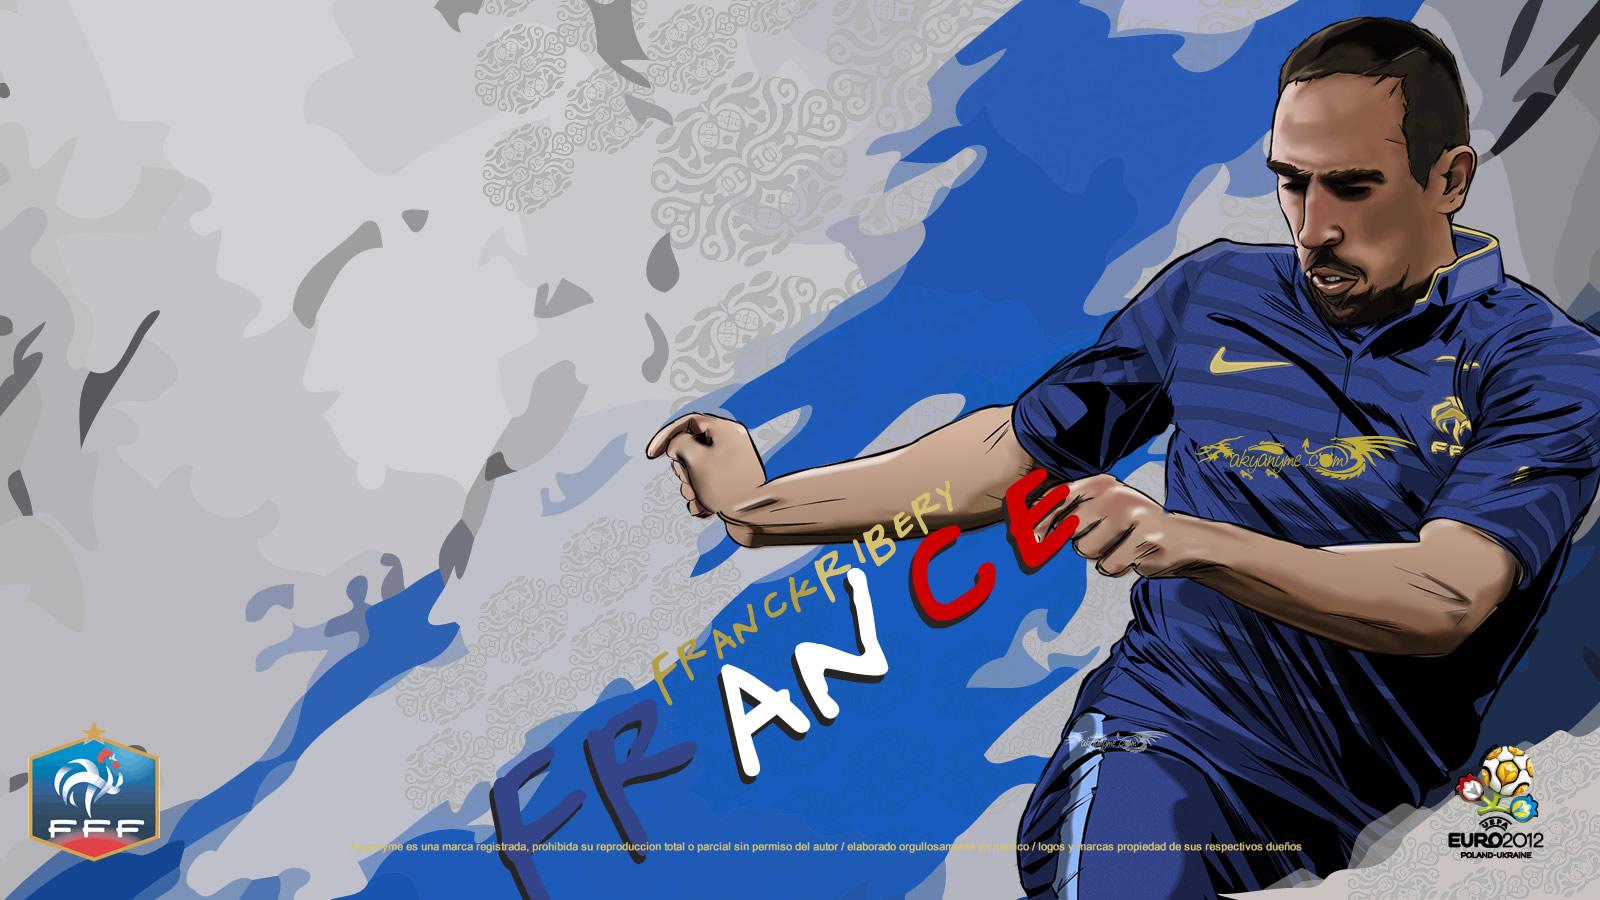 Anime Girl Wallpaper Hd Icon French National Football Team Franck Ribery Wallpaper